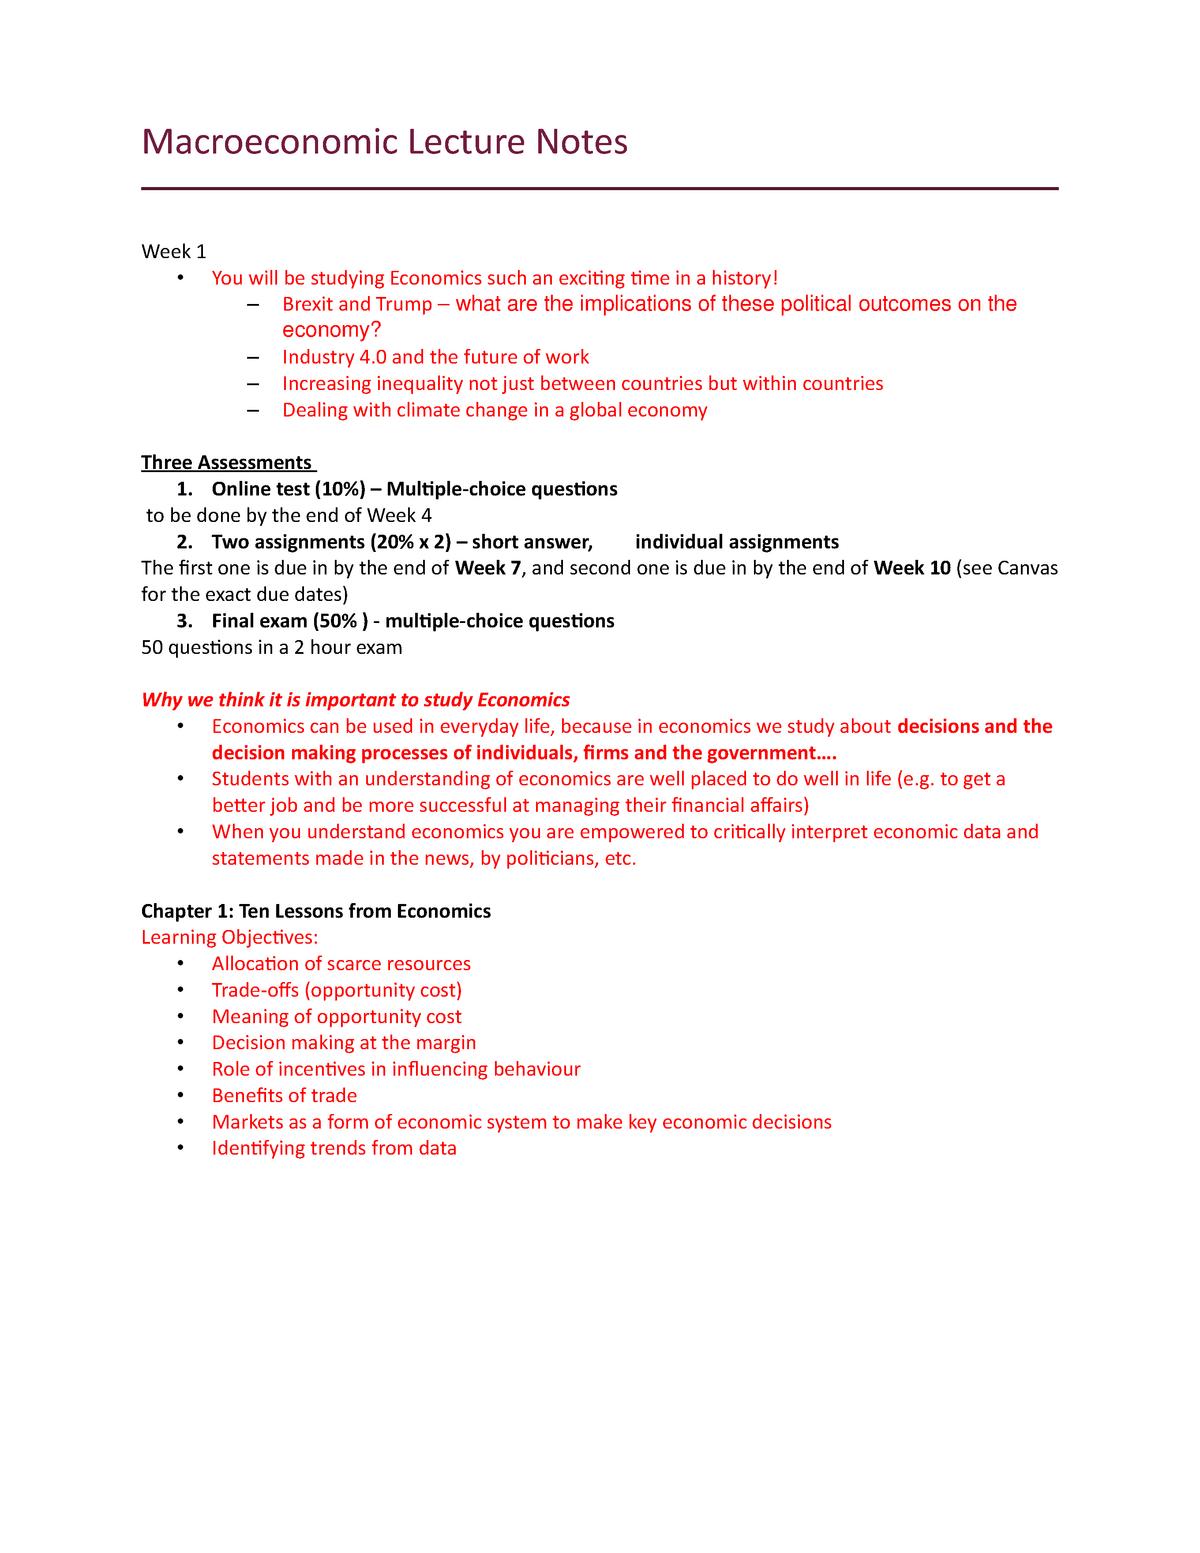 Macro Lecture Notes - ECON1016 - RMIT - StuDocu